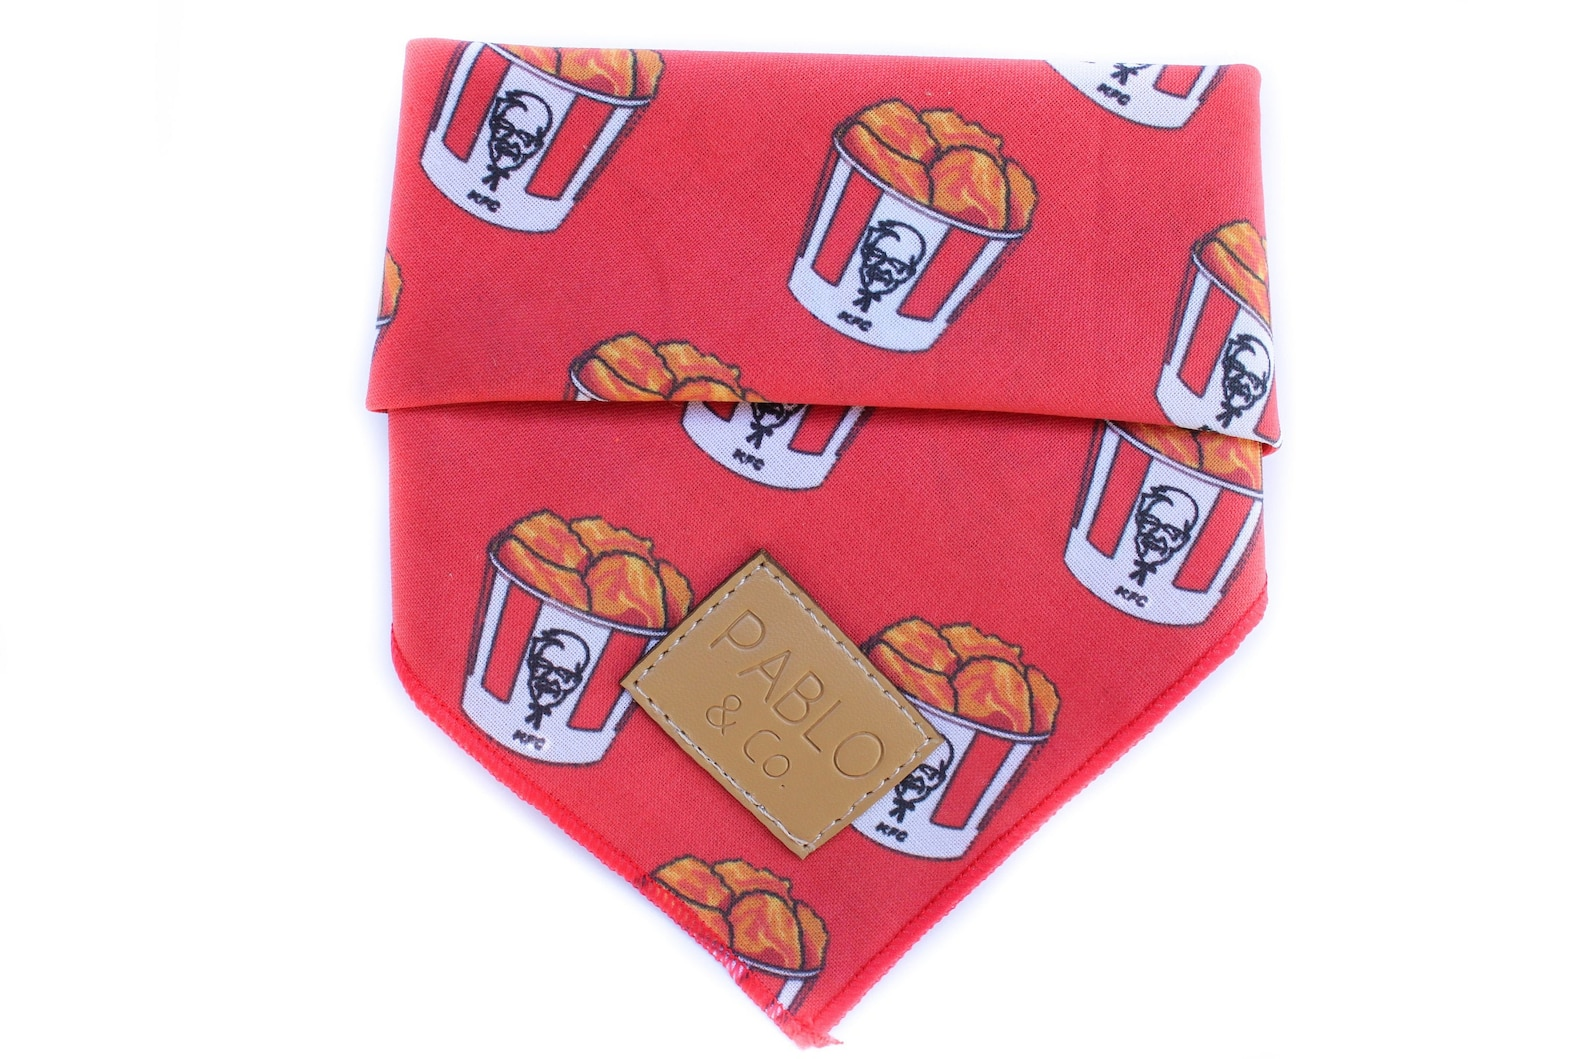 KFC print dog bandana